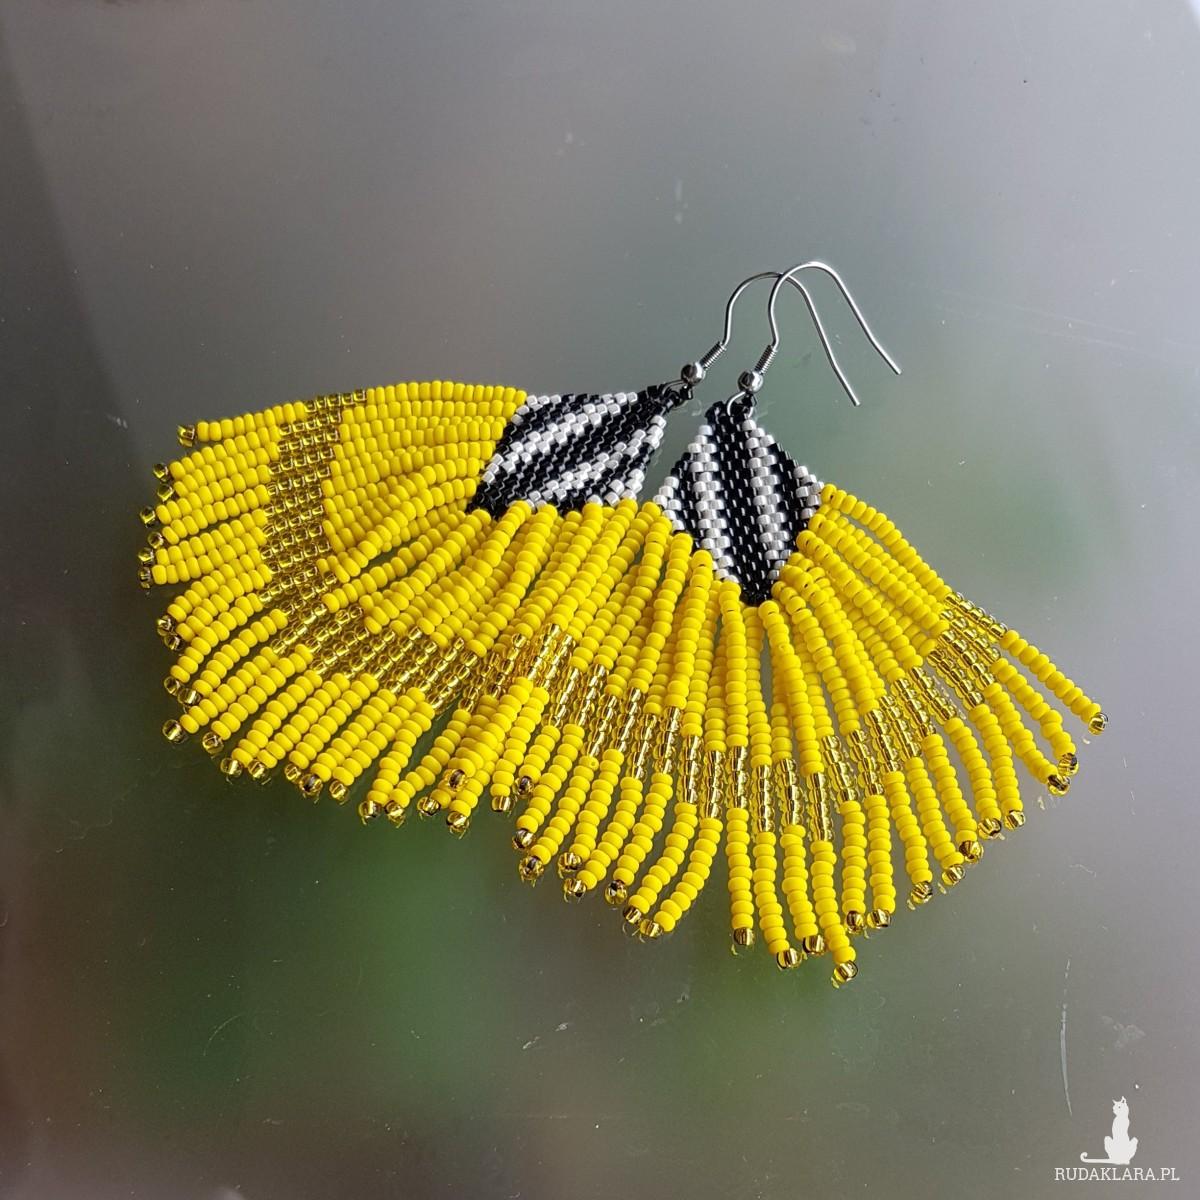 Kolczyki Boho Chic Żółte Frędzle